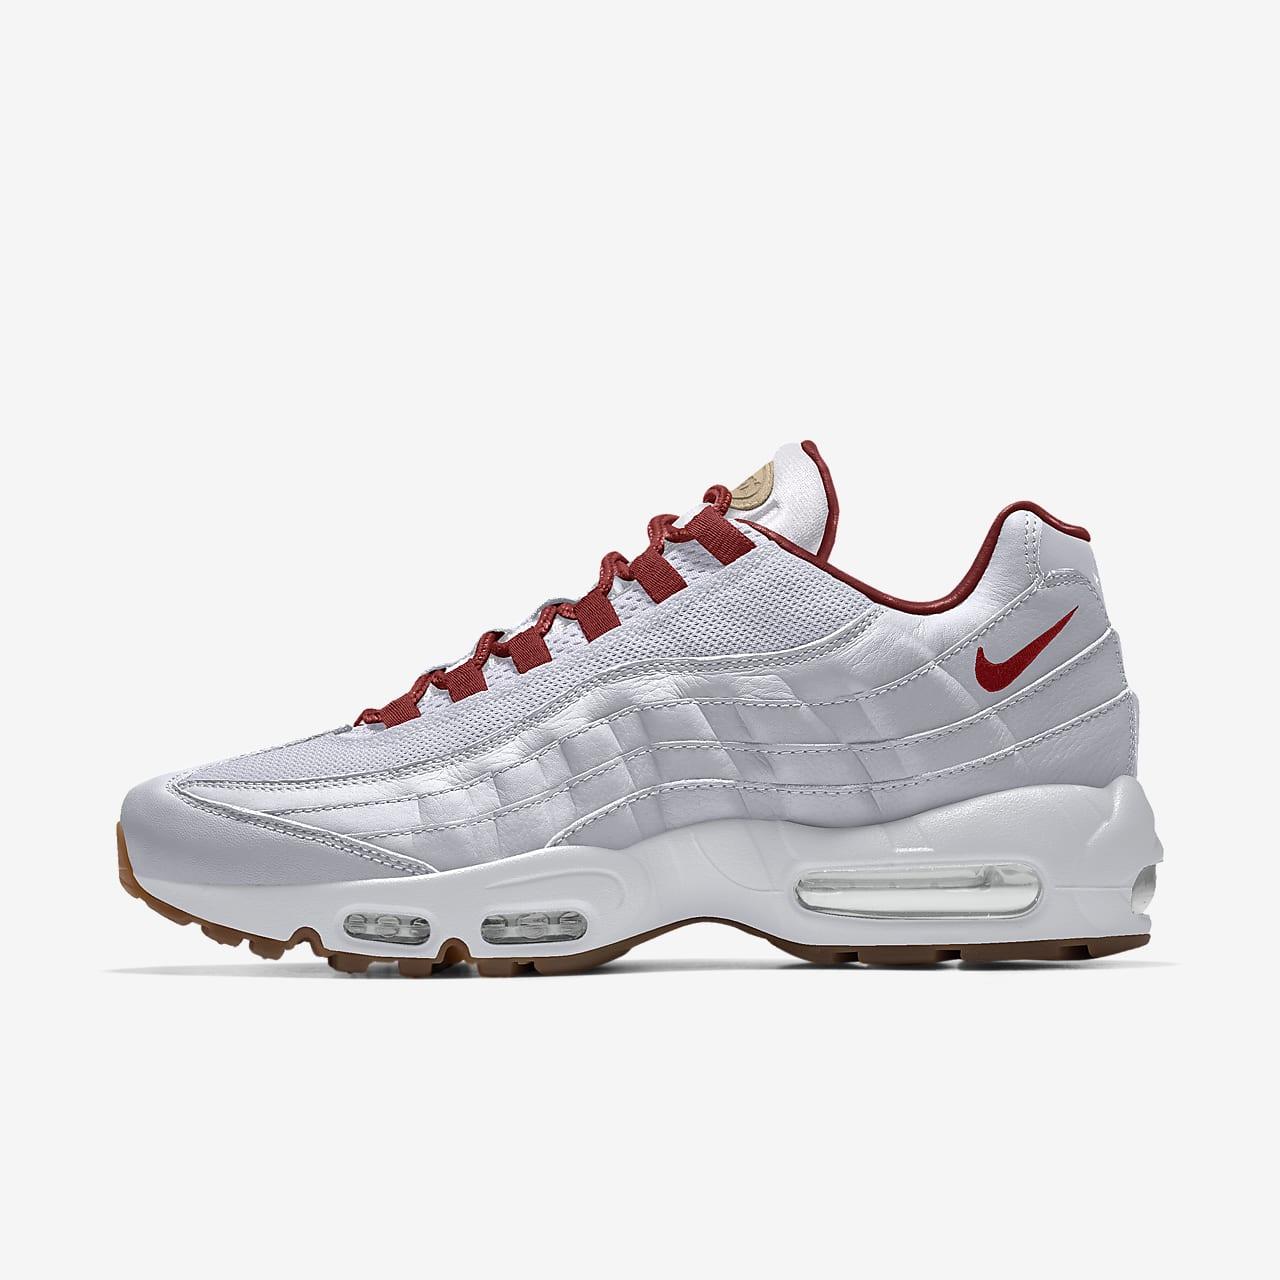 Nike Air Max 95 Premium By You Custom Shoe